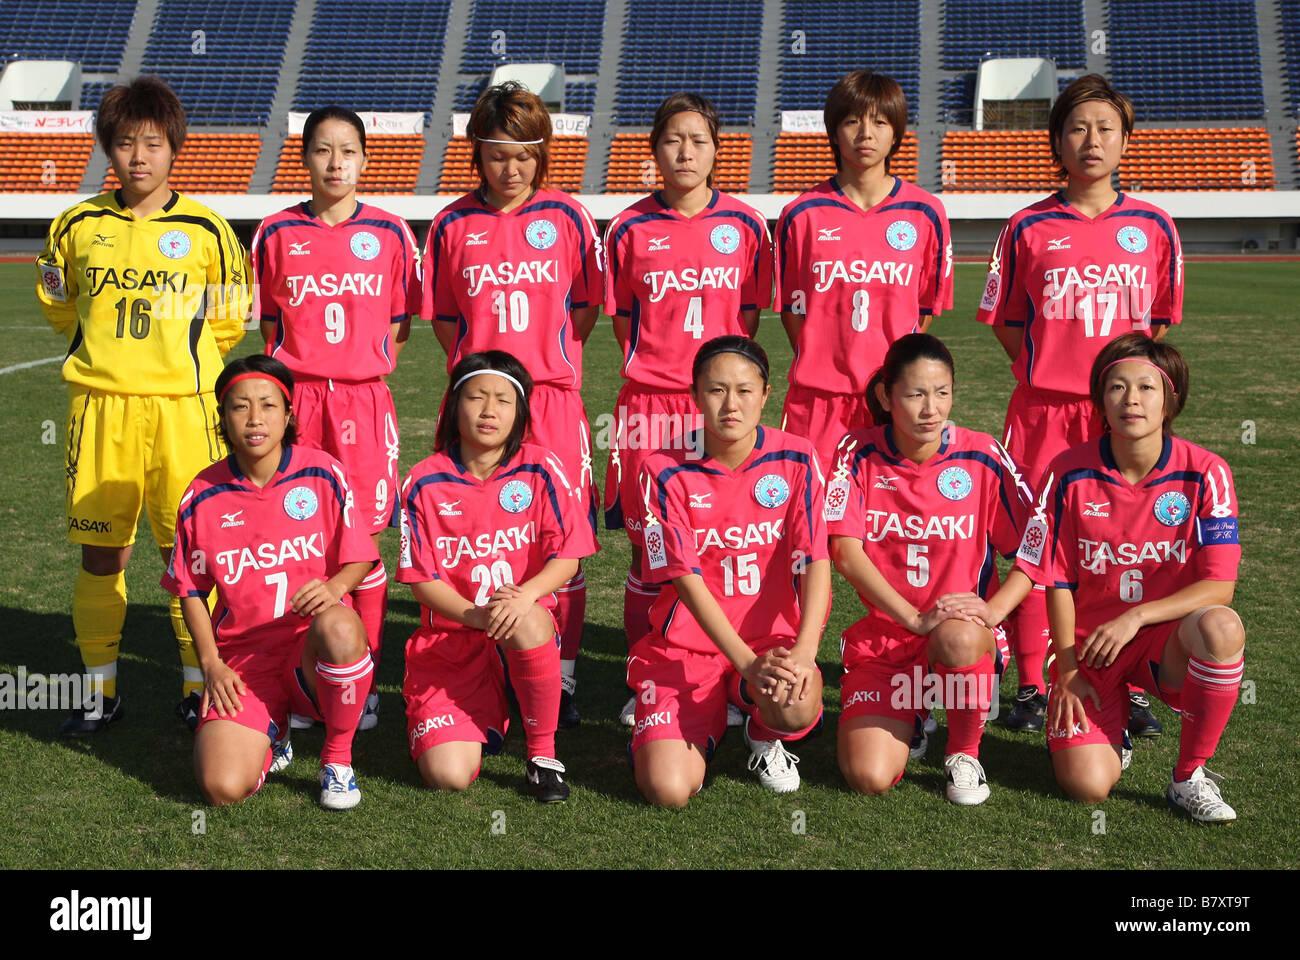 TASAKI y FC Tasaki Perule team group line up NOVEMBER 23 2008 Football 2008 NADESHIKO League Division 1 between - Stock Image